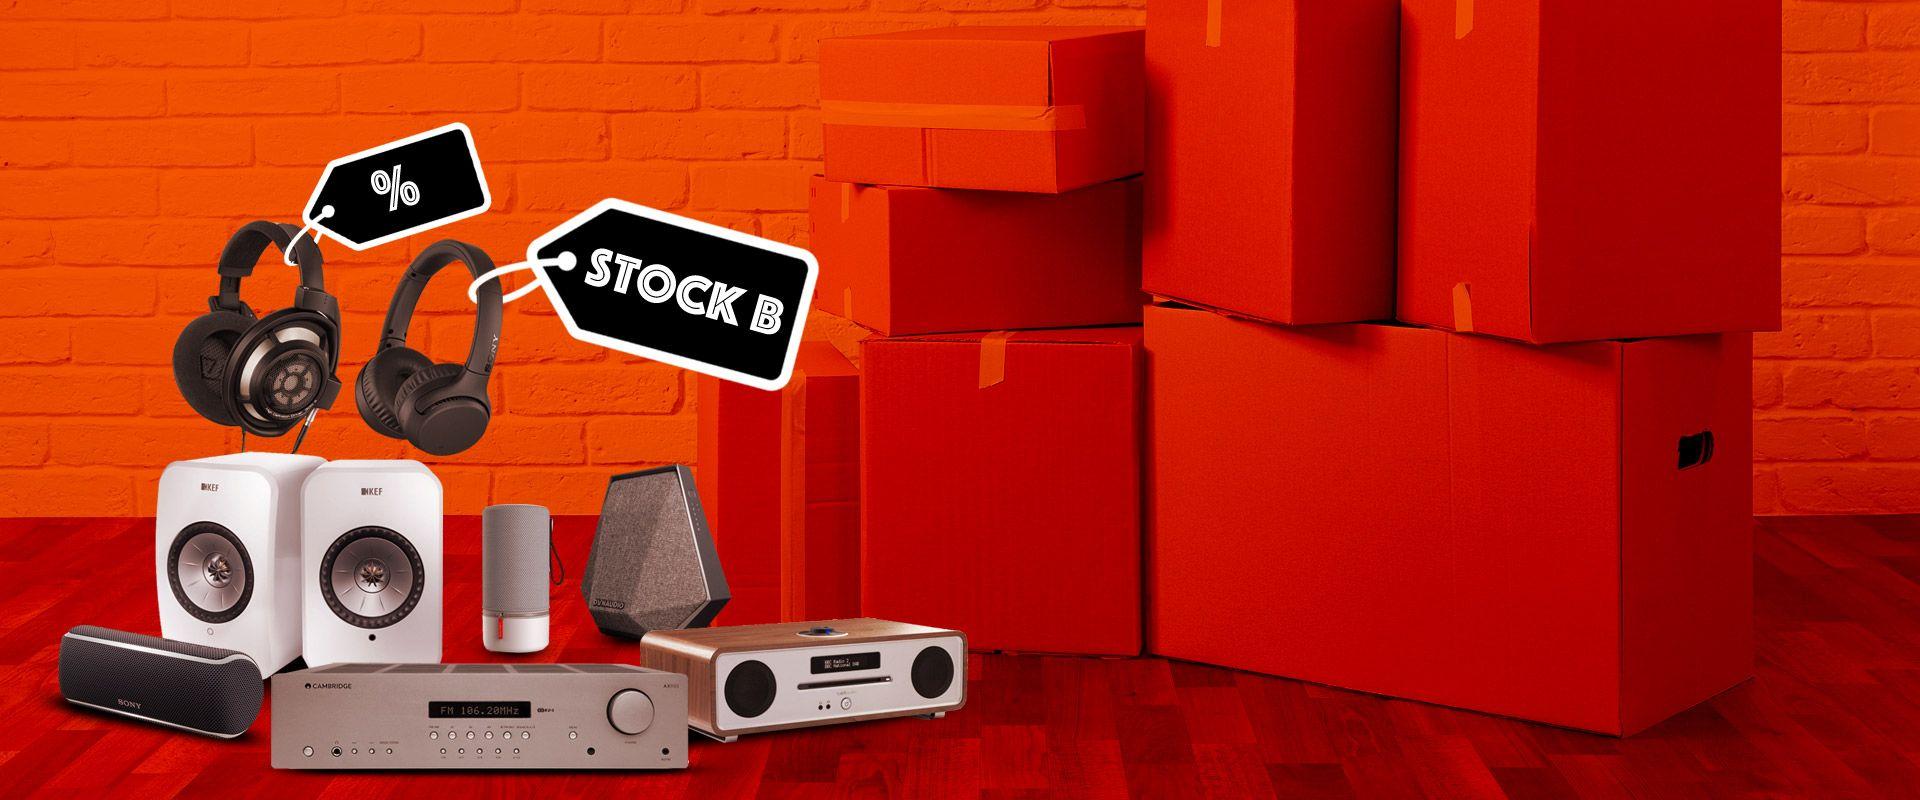 Déstockage & stocks B